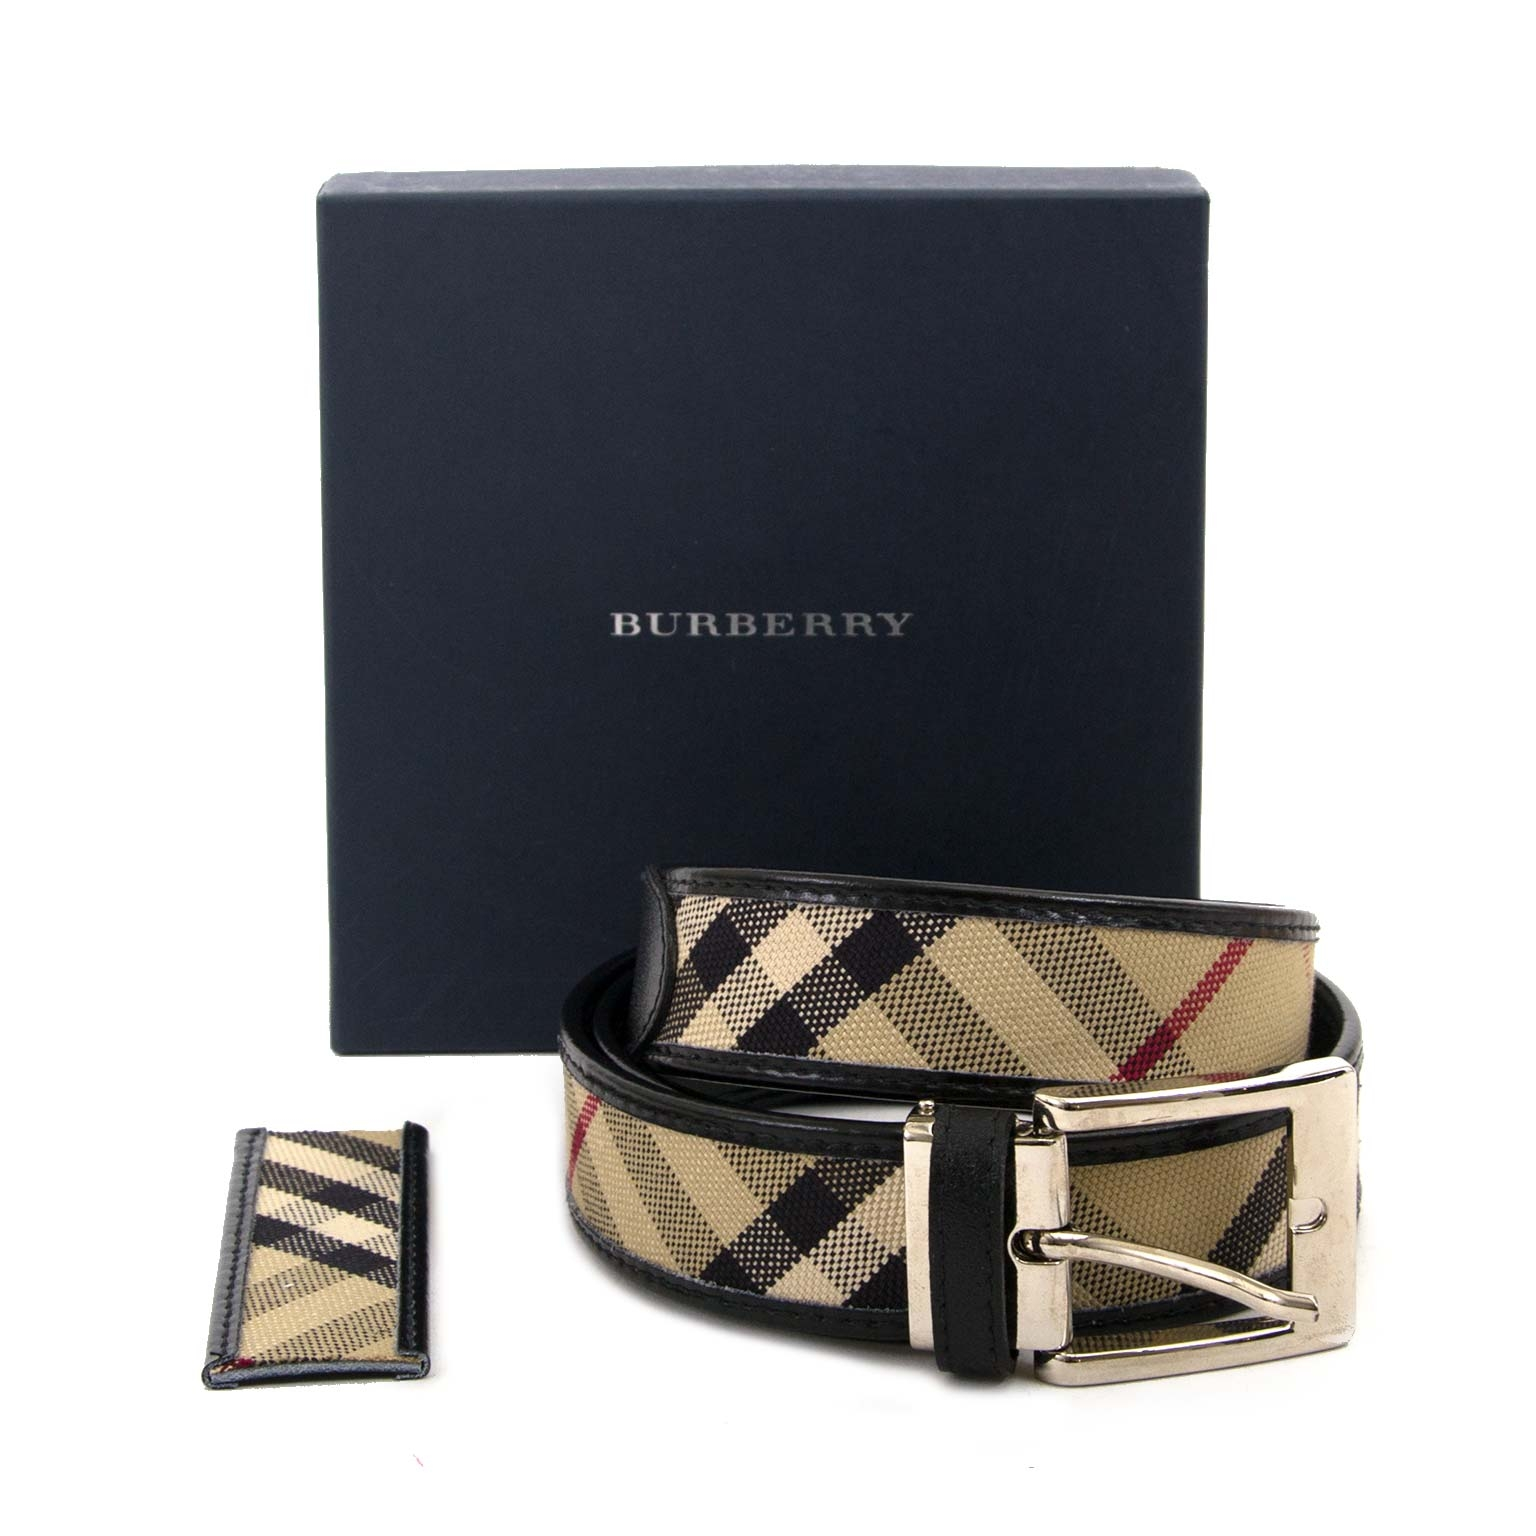 burberry beige nova check and black leather belt now for sale at labellov vintage fashion webshop belgium